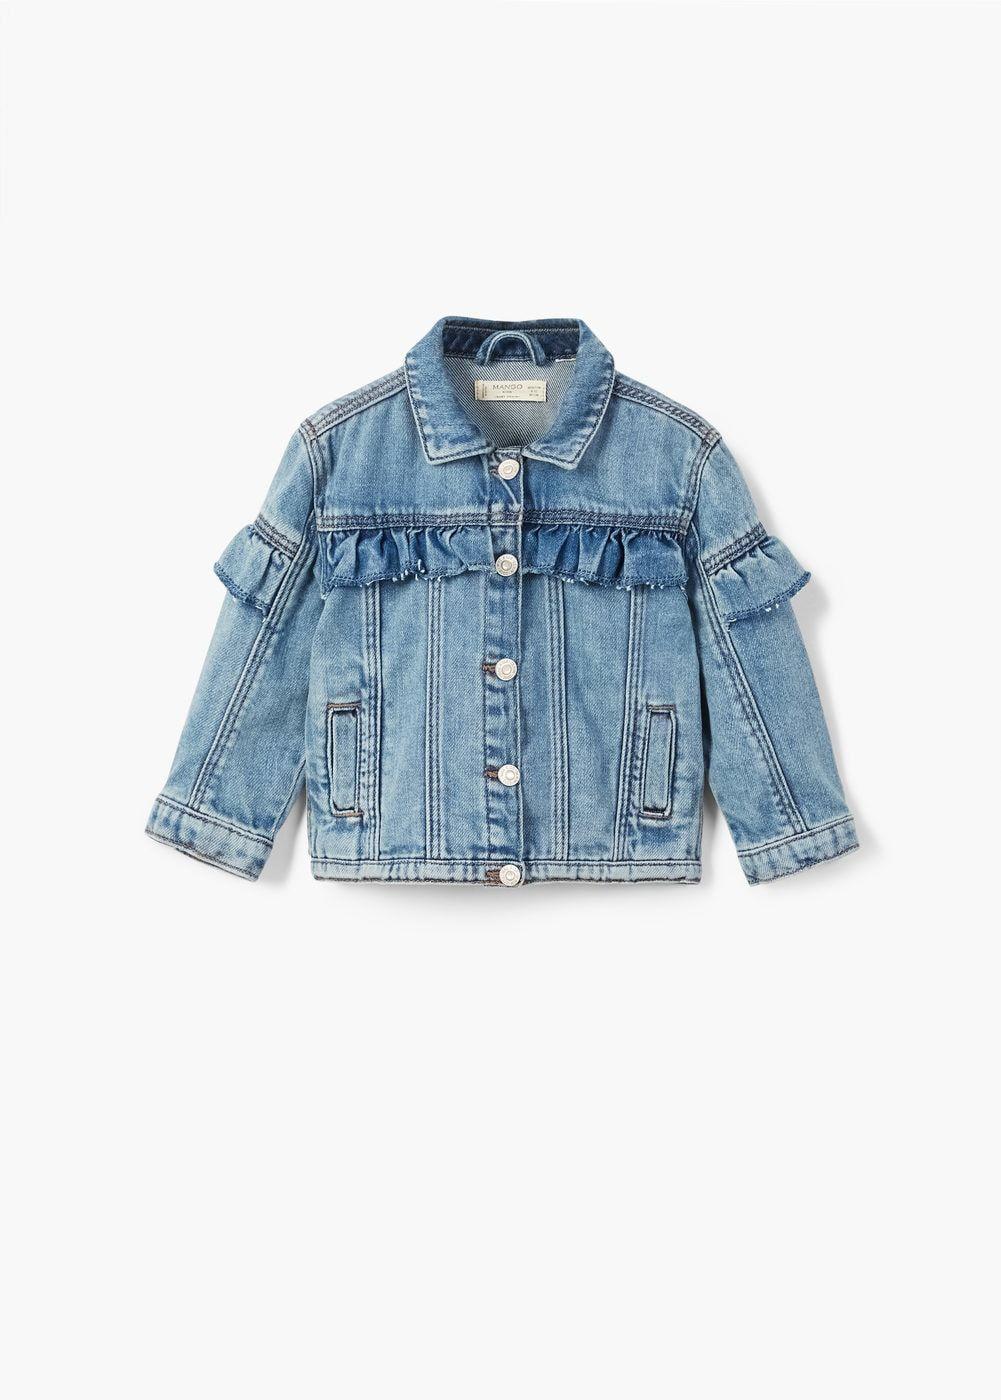 Cazadora Denim Volantes Nina Mango Kids Espana Kids Denim Jacket Baby Denim Jacket Girls Denim Jacket [ 1400 x 1001 Pixel ]